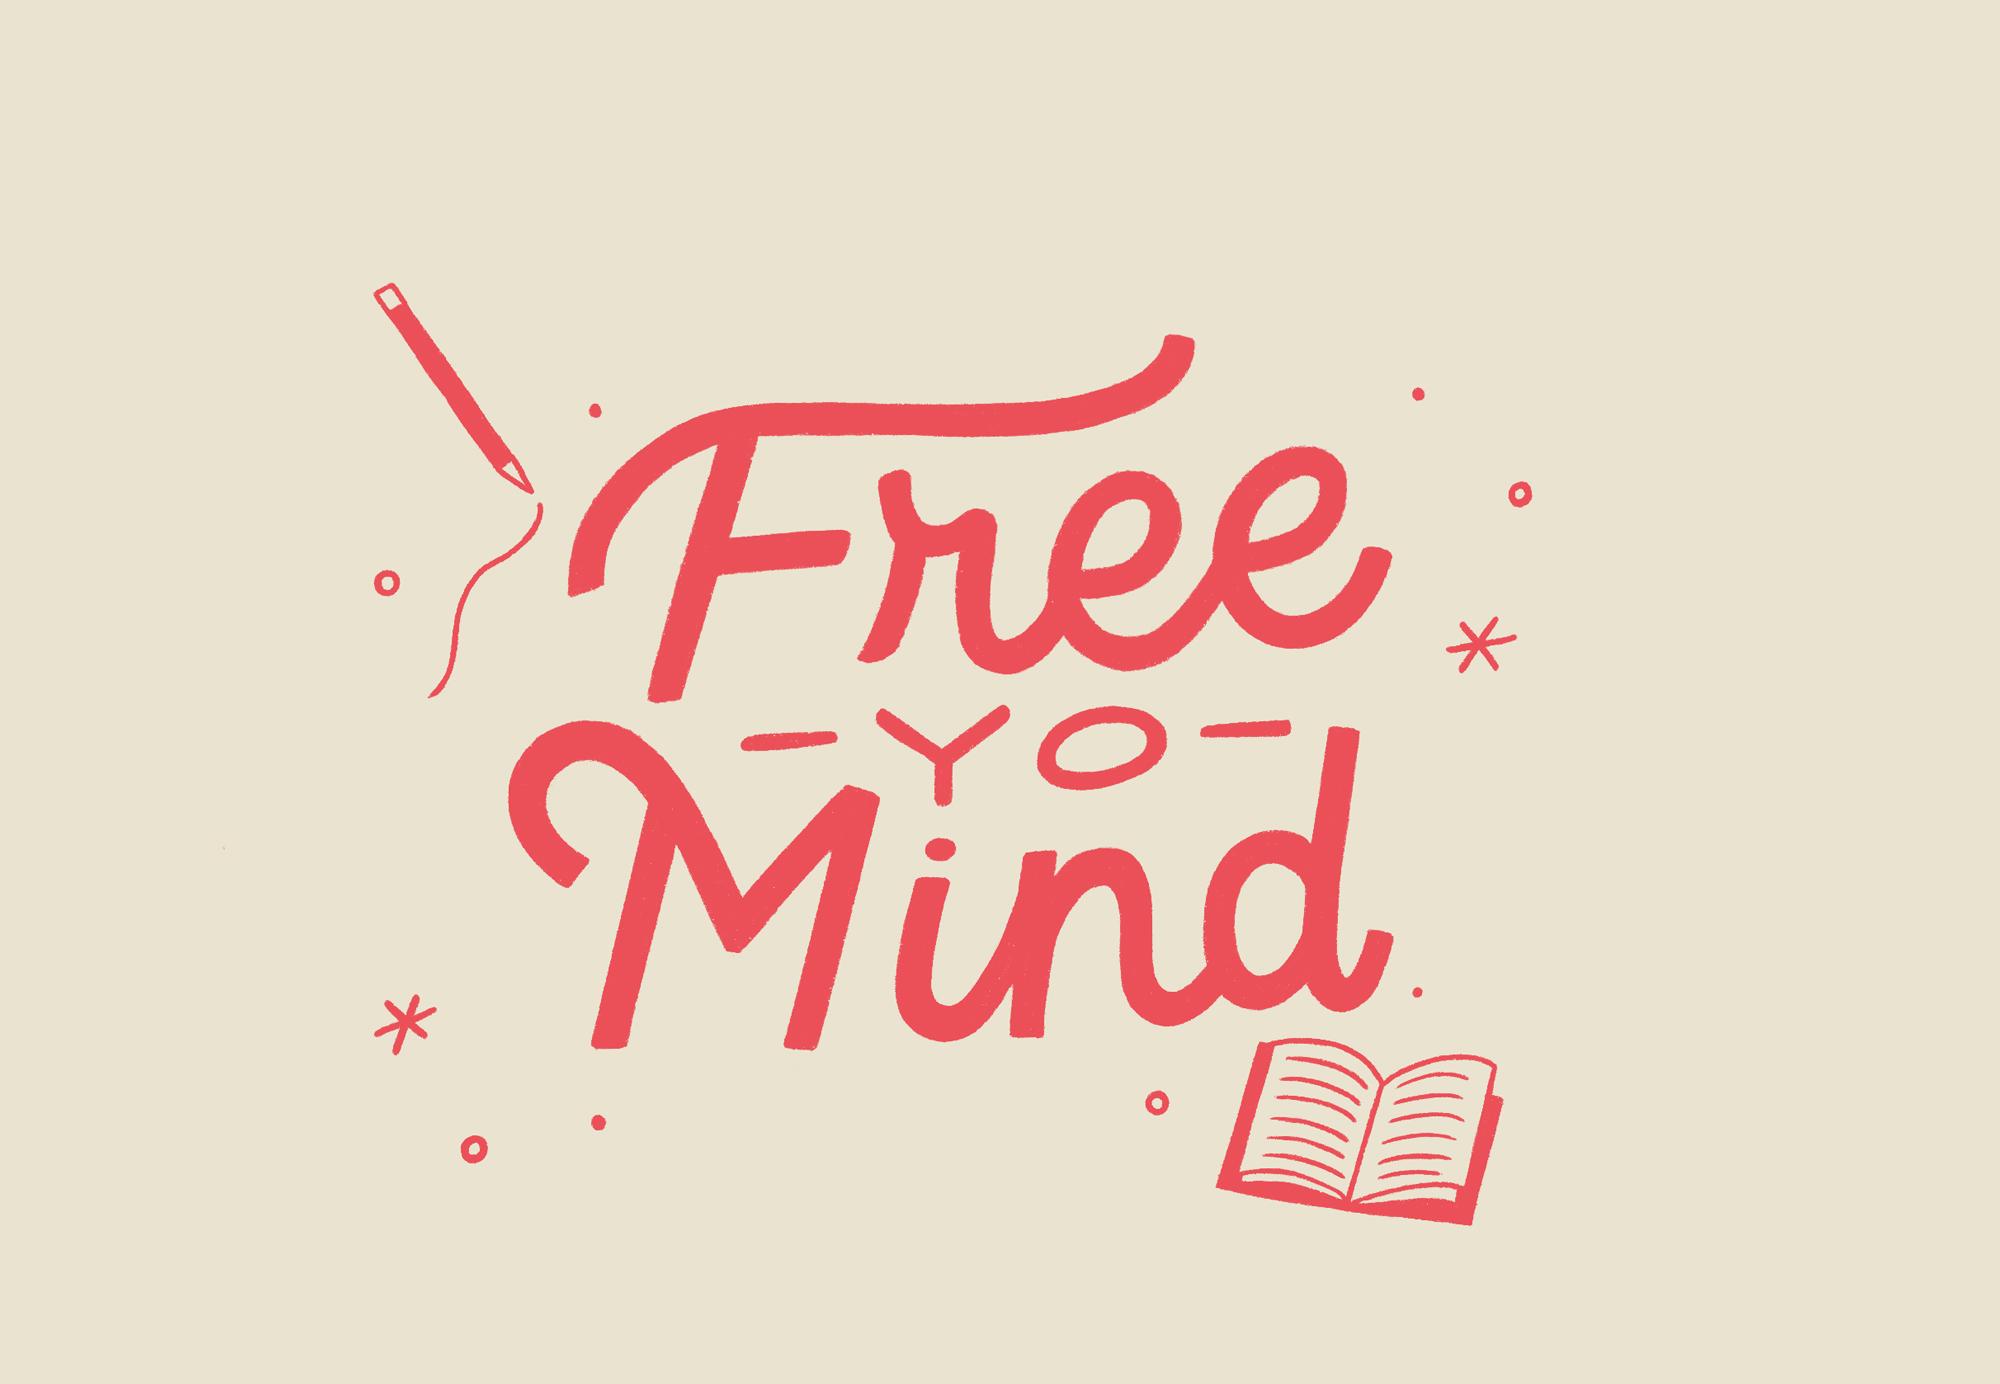 Free_mind.jpg